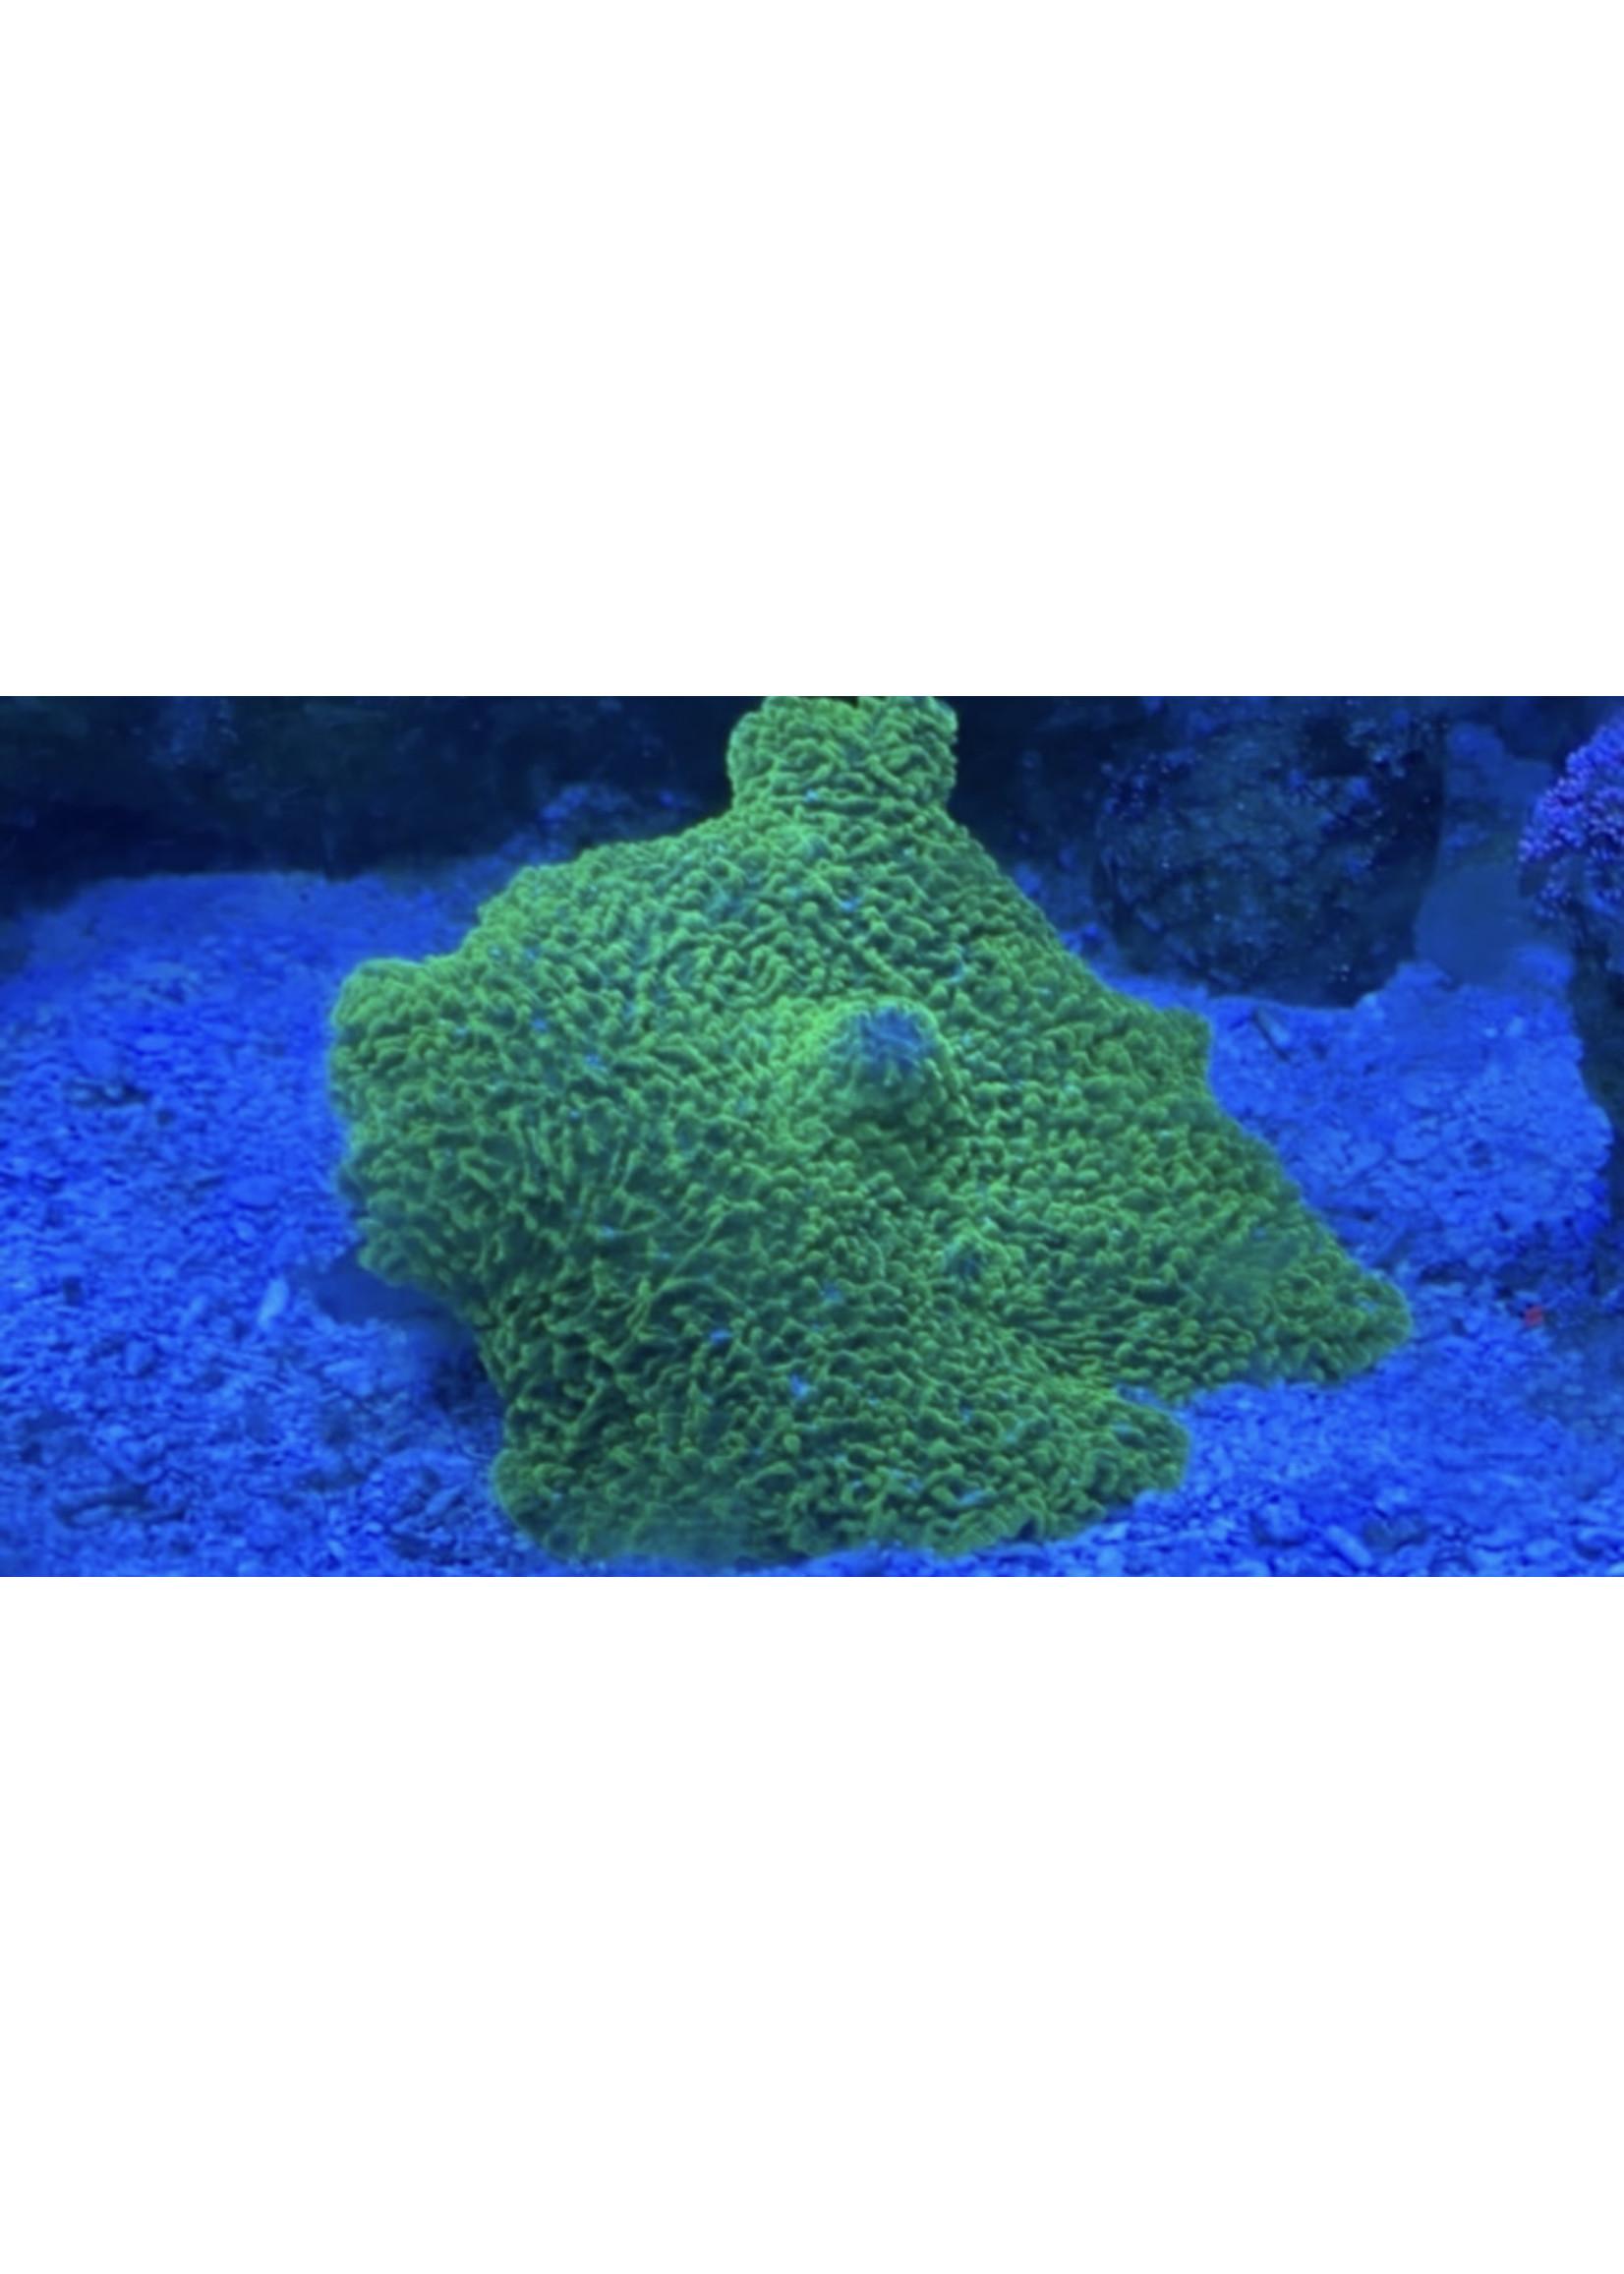 Elephant Ear Mushroom Coral